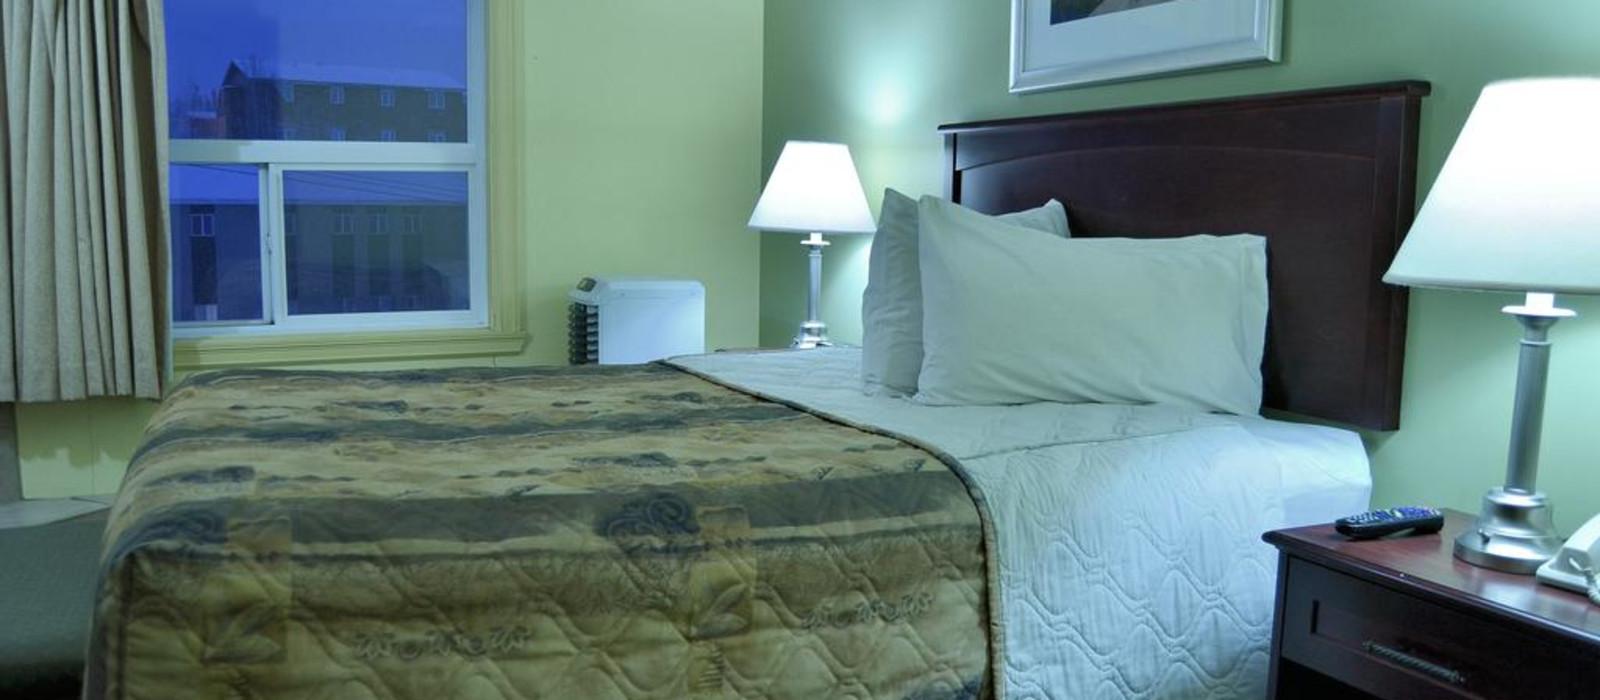 Hotel Nova Inn Canada